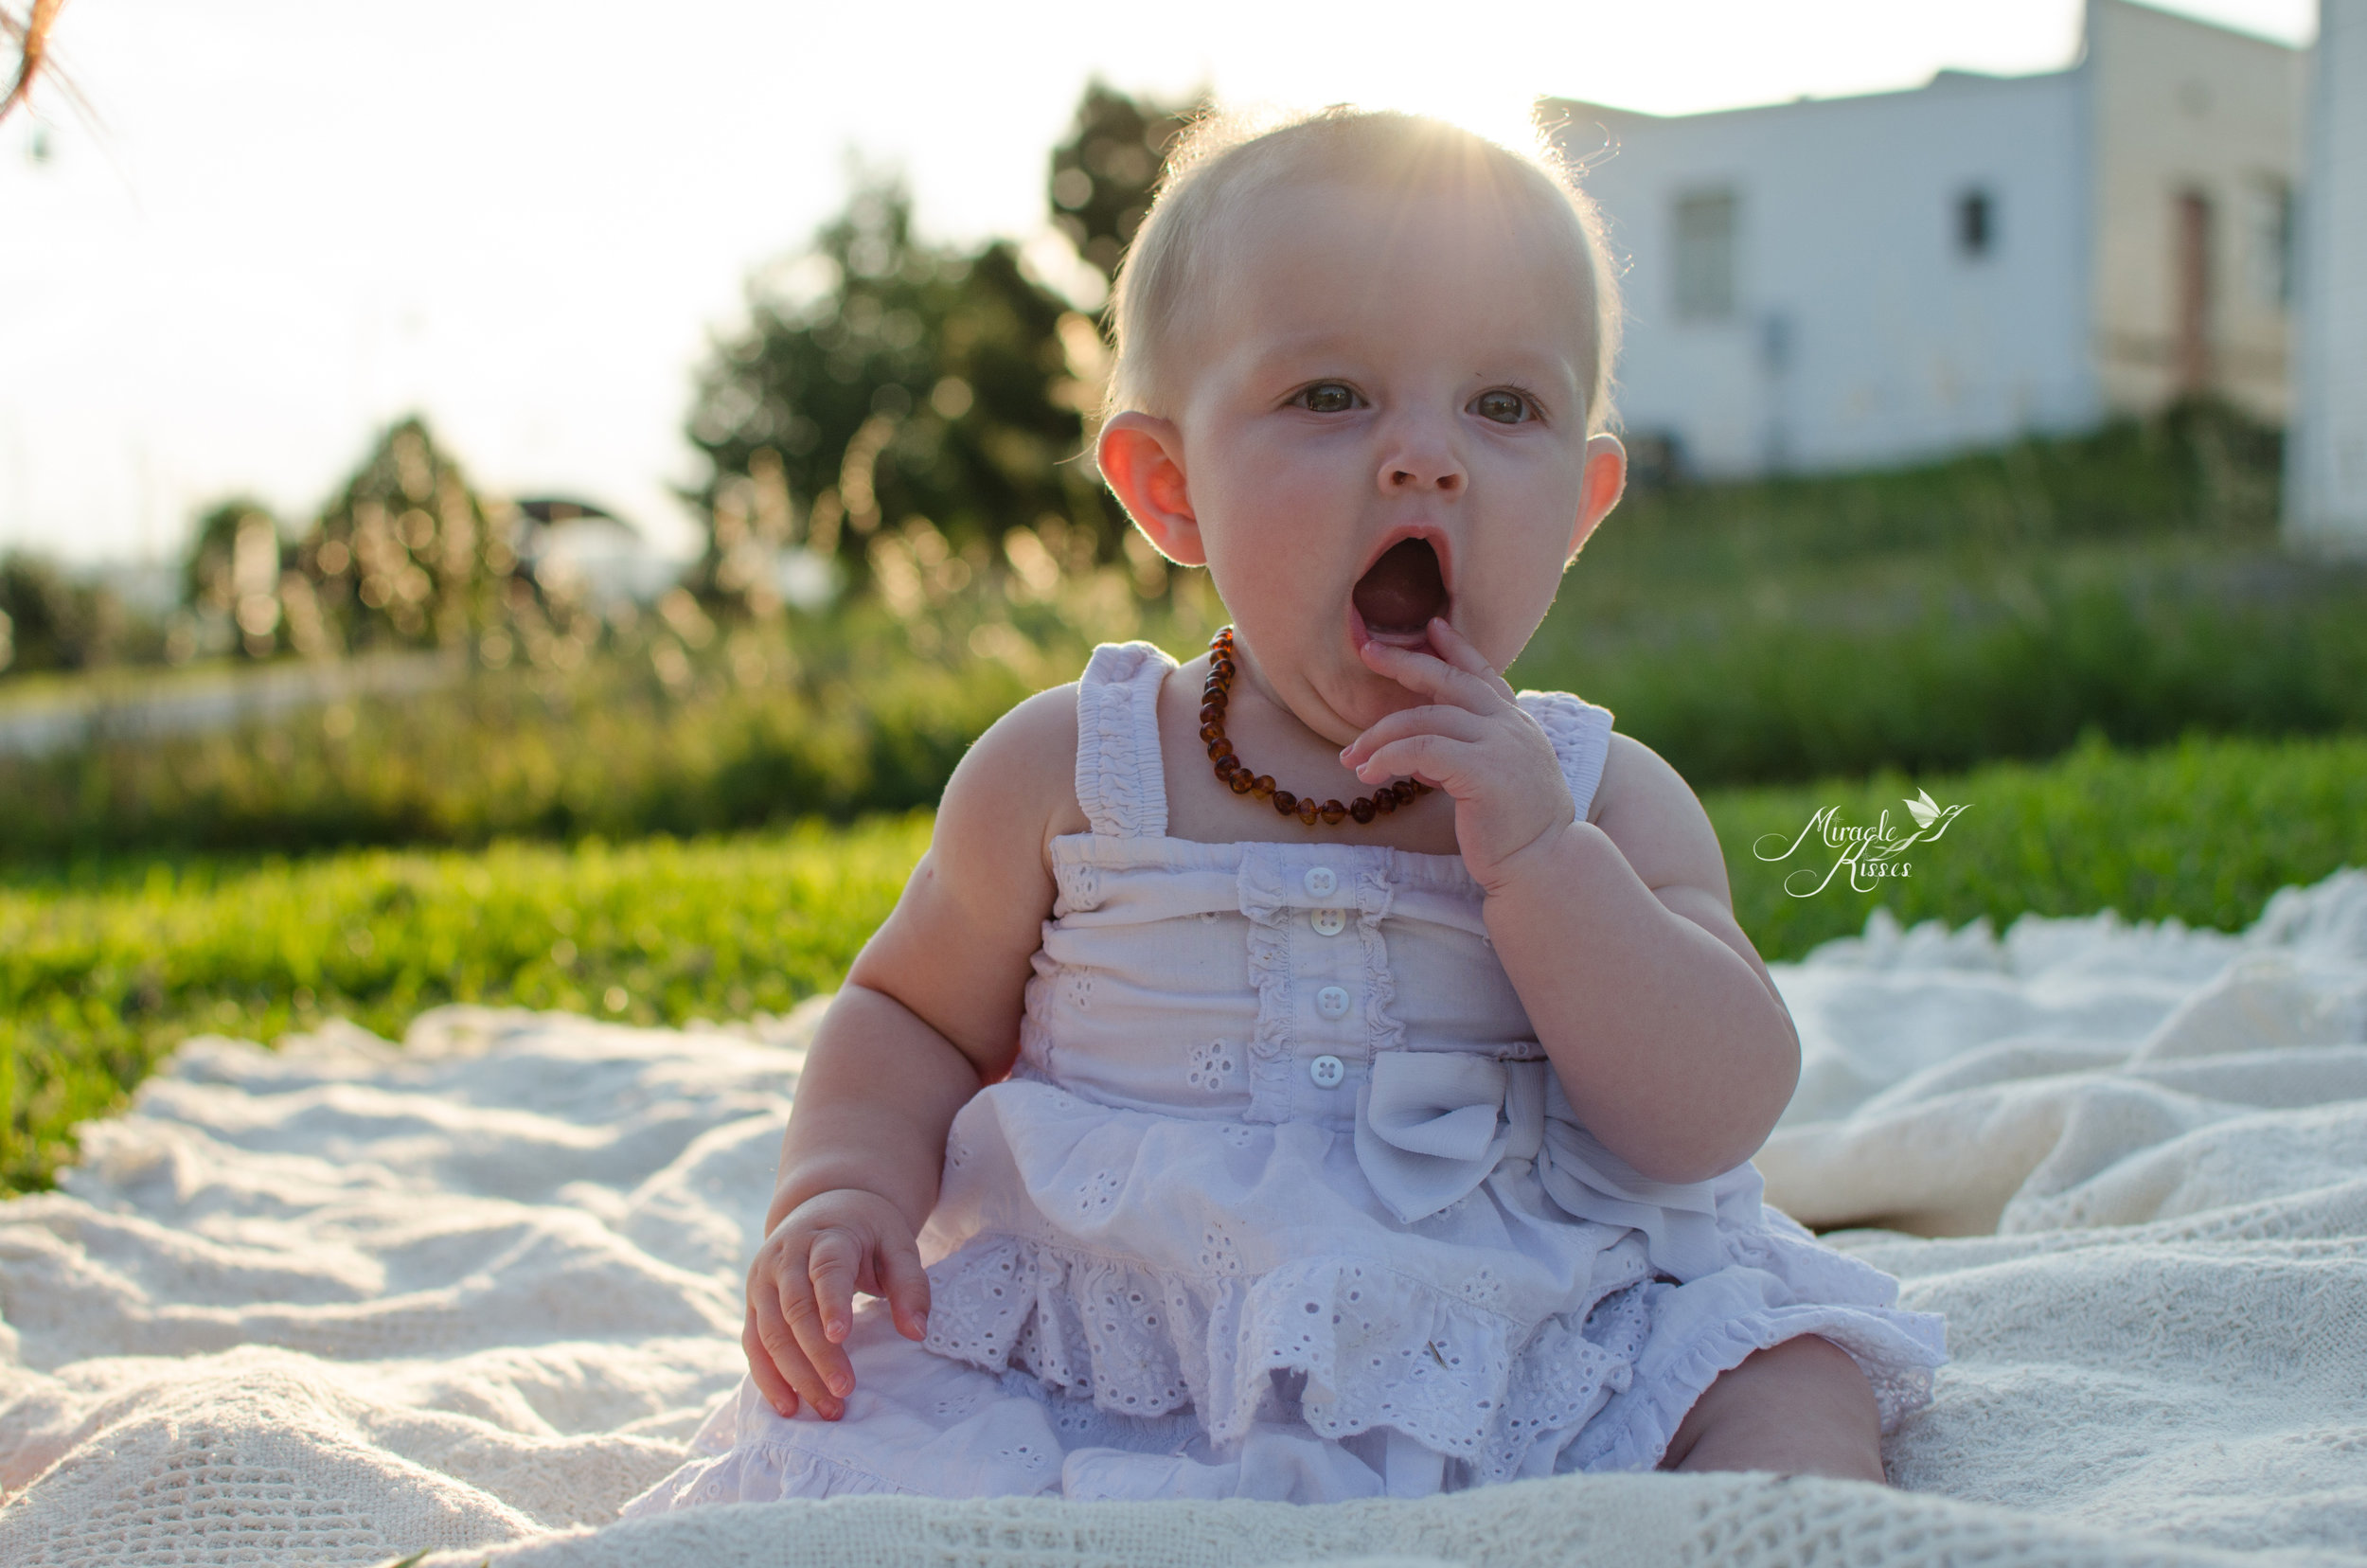 yawning kiddo, milestone photo, nursing story